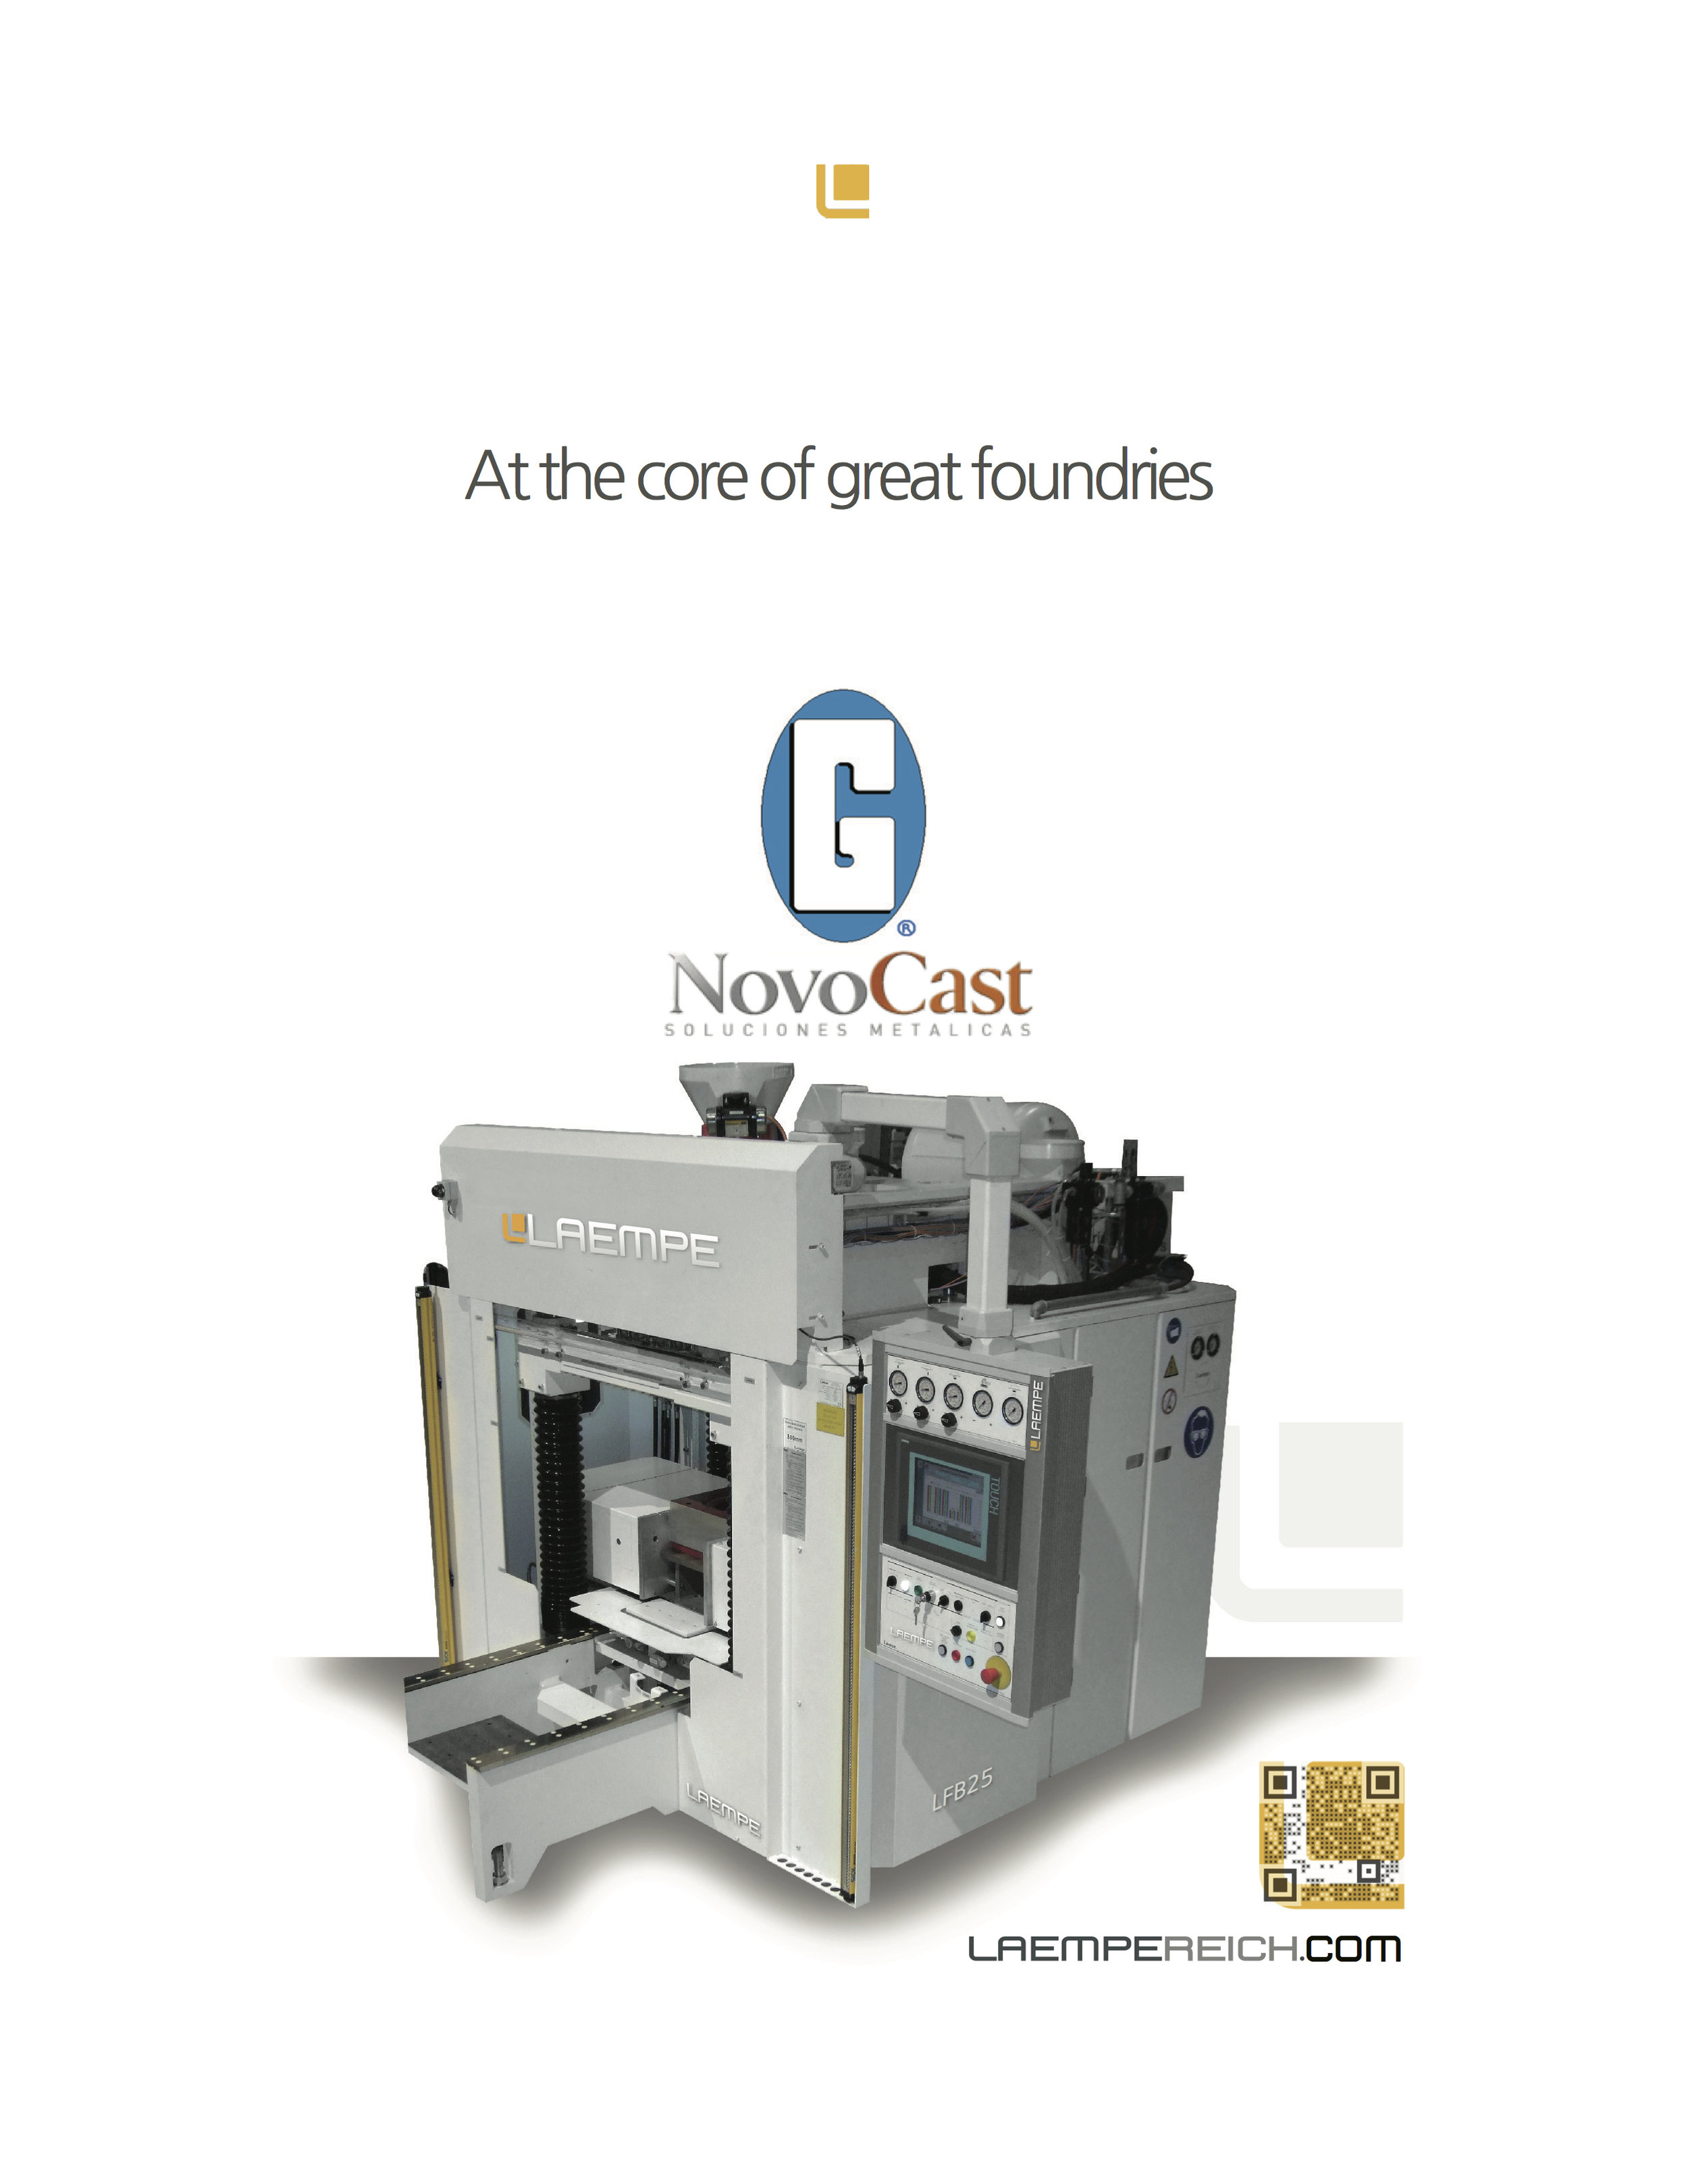 Grede Novocast - Approved Magazine ad - Oct 2014.jpg